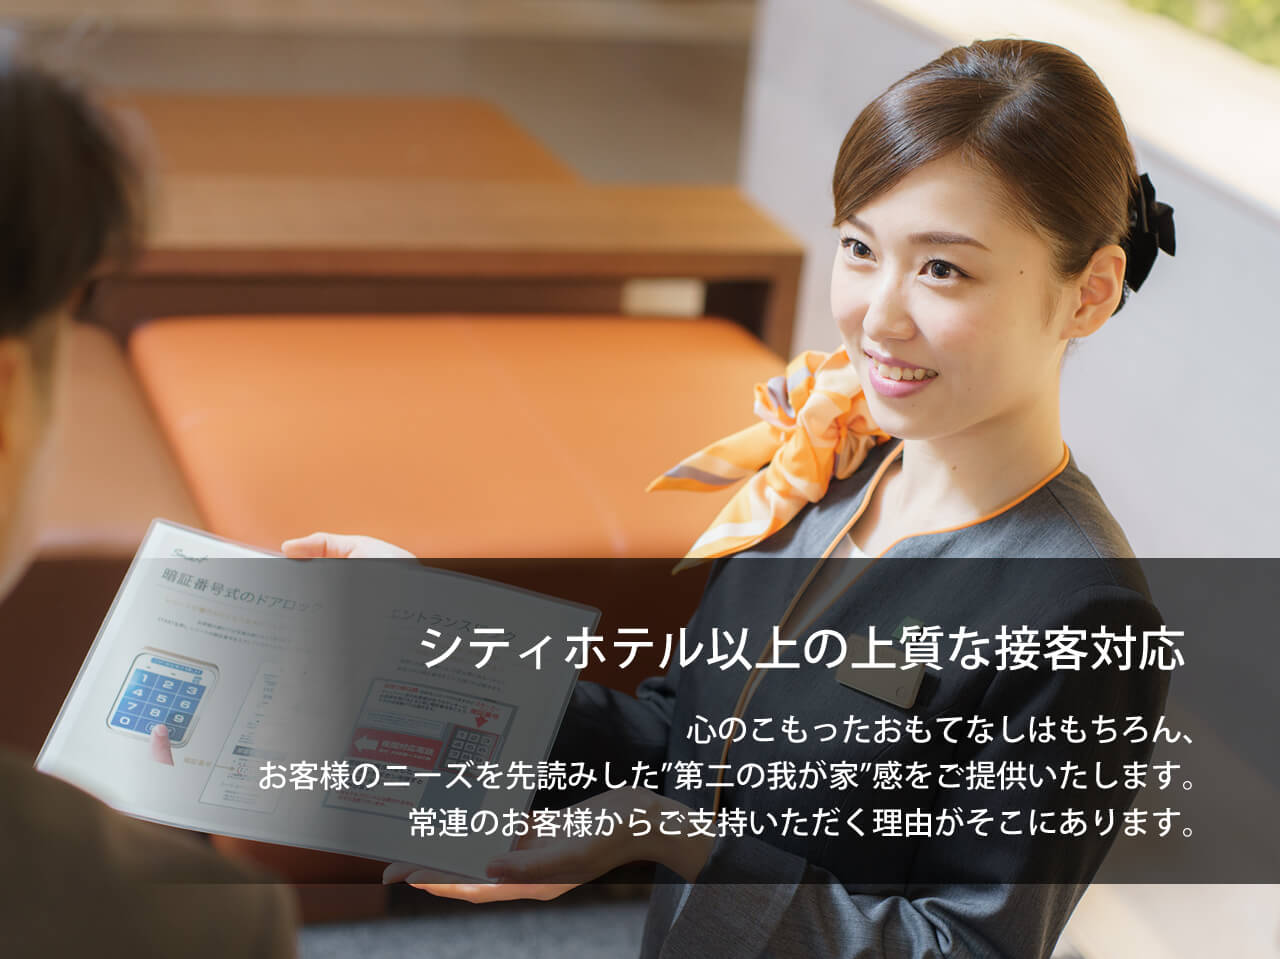 Super Hotel Okazaki